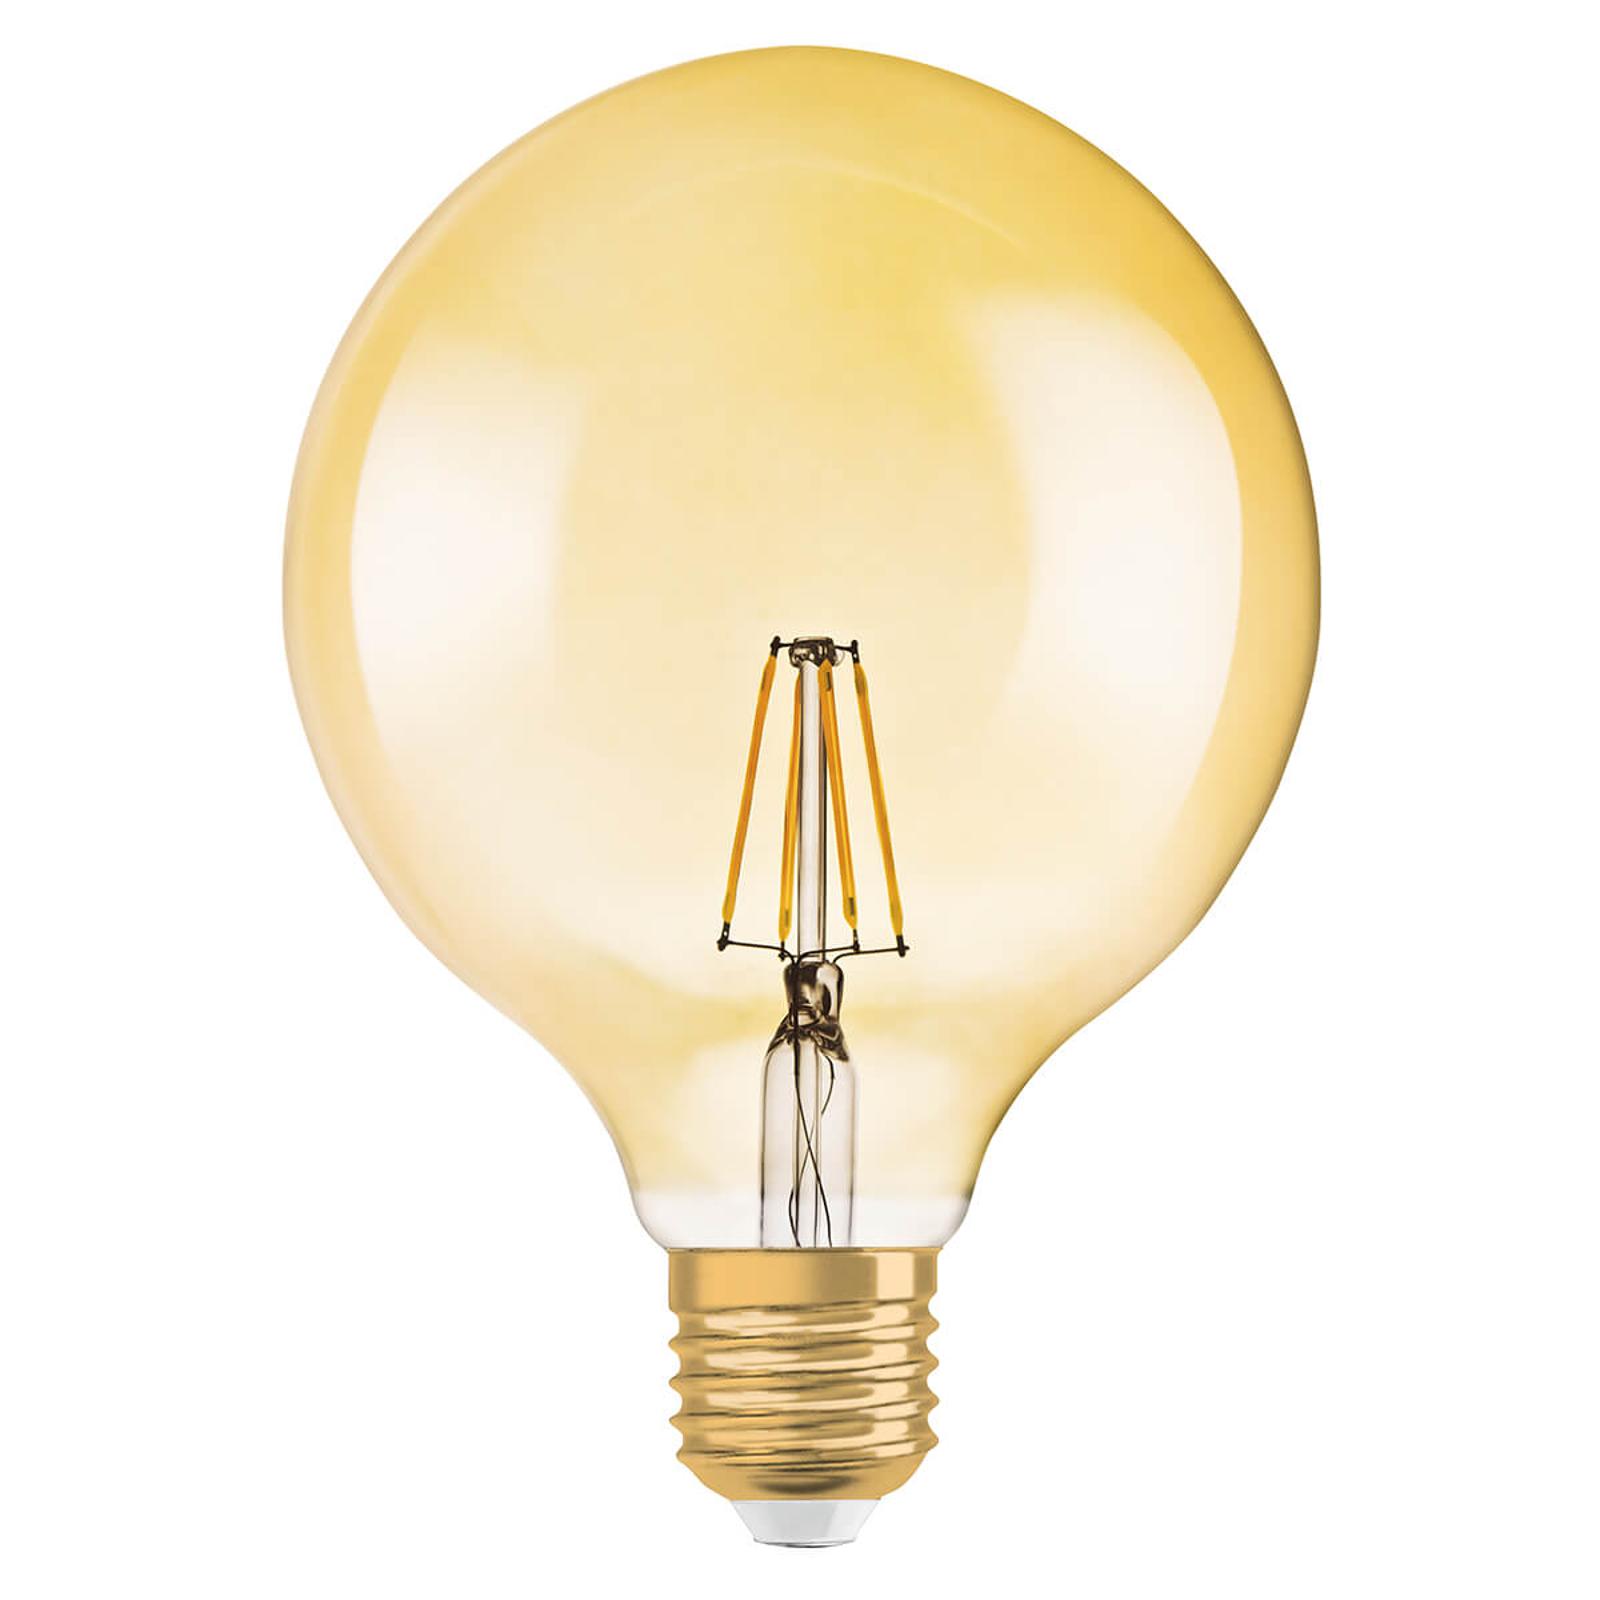 LED-Globelampe Gold E27 2,8W, warmweiß, 220 Lumen